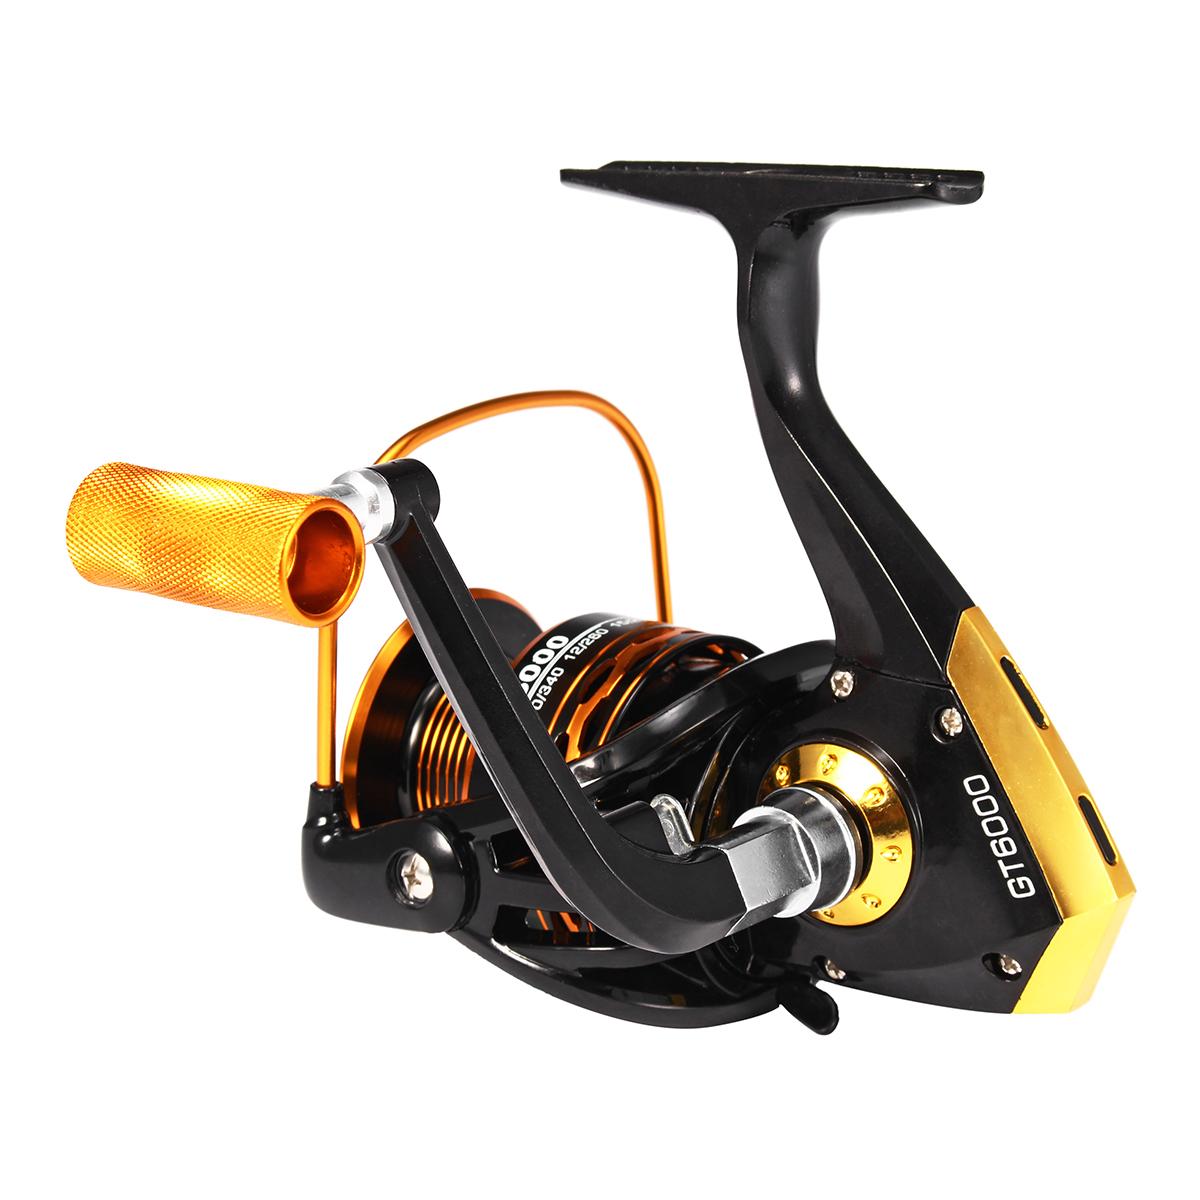 ZANLURE Metal+Plastic 4000-6000 Spinning Fishing Reel Salwater Freshwater Fishing Reel